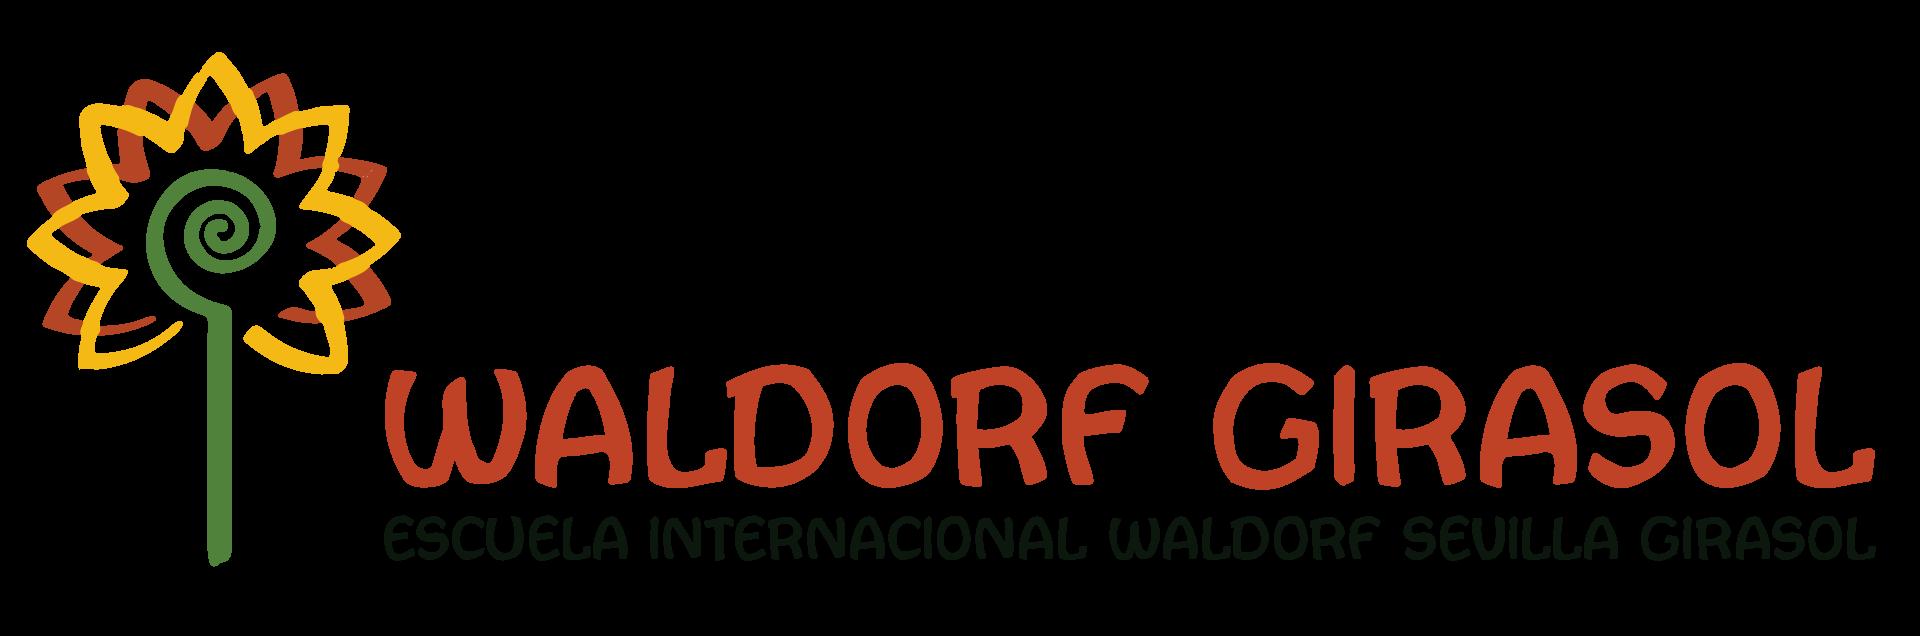 LOGO-GIRASOL NUEVO2018-2019